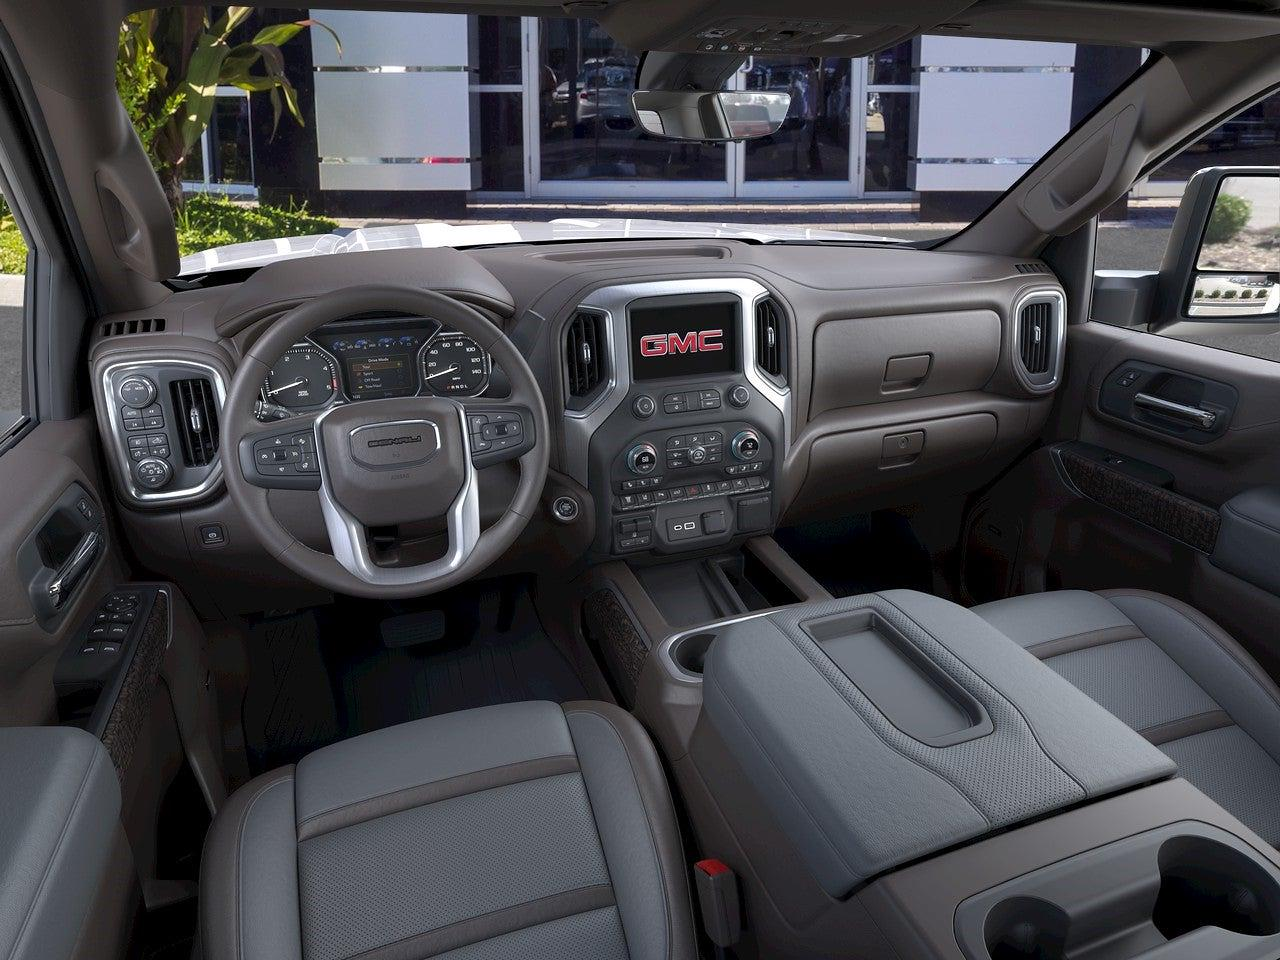 2021 GMC Sierra 3500 Crew Cab 4x4, Pickup #T21312 - photo 13